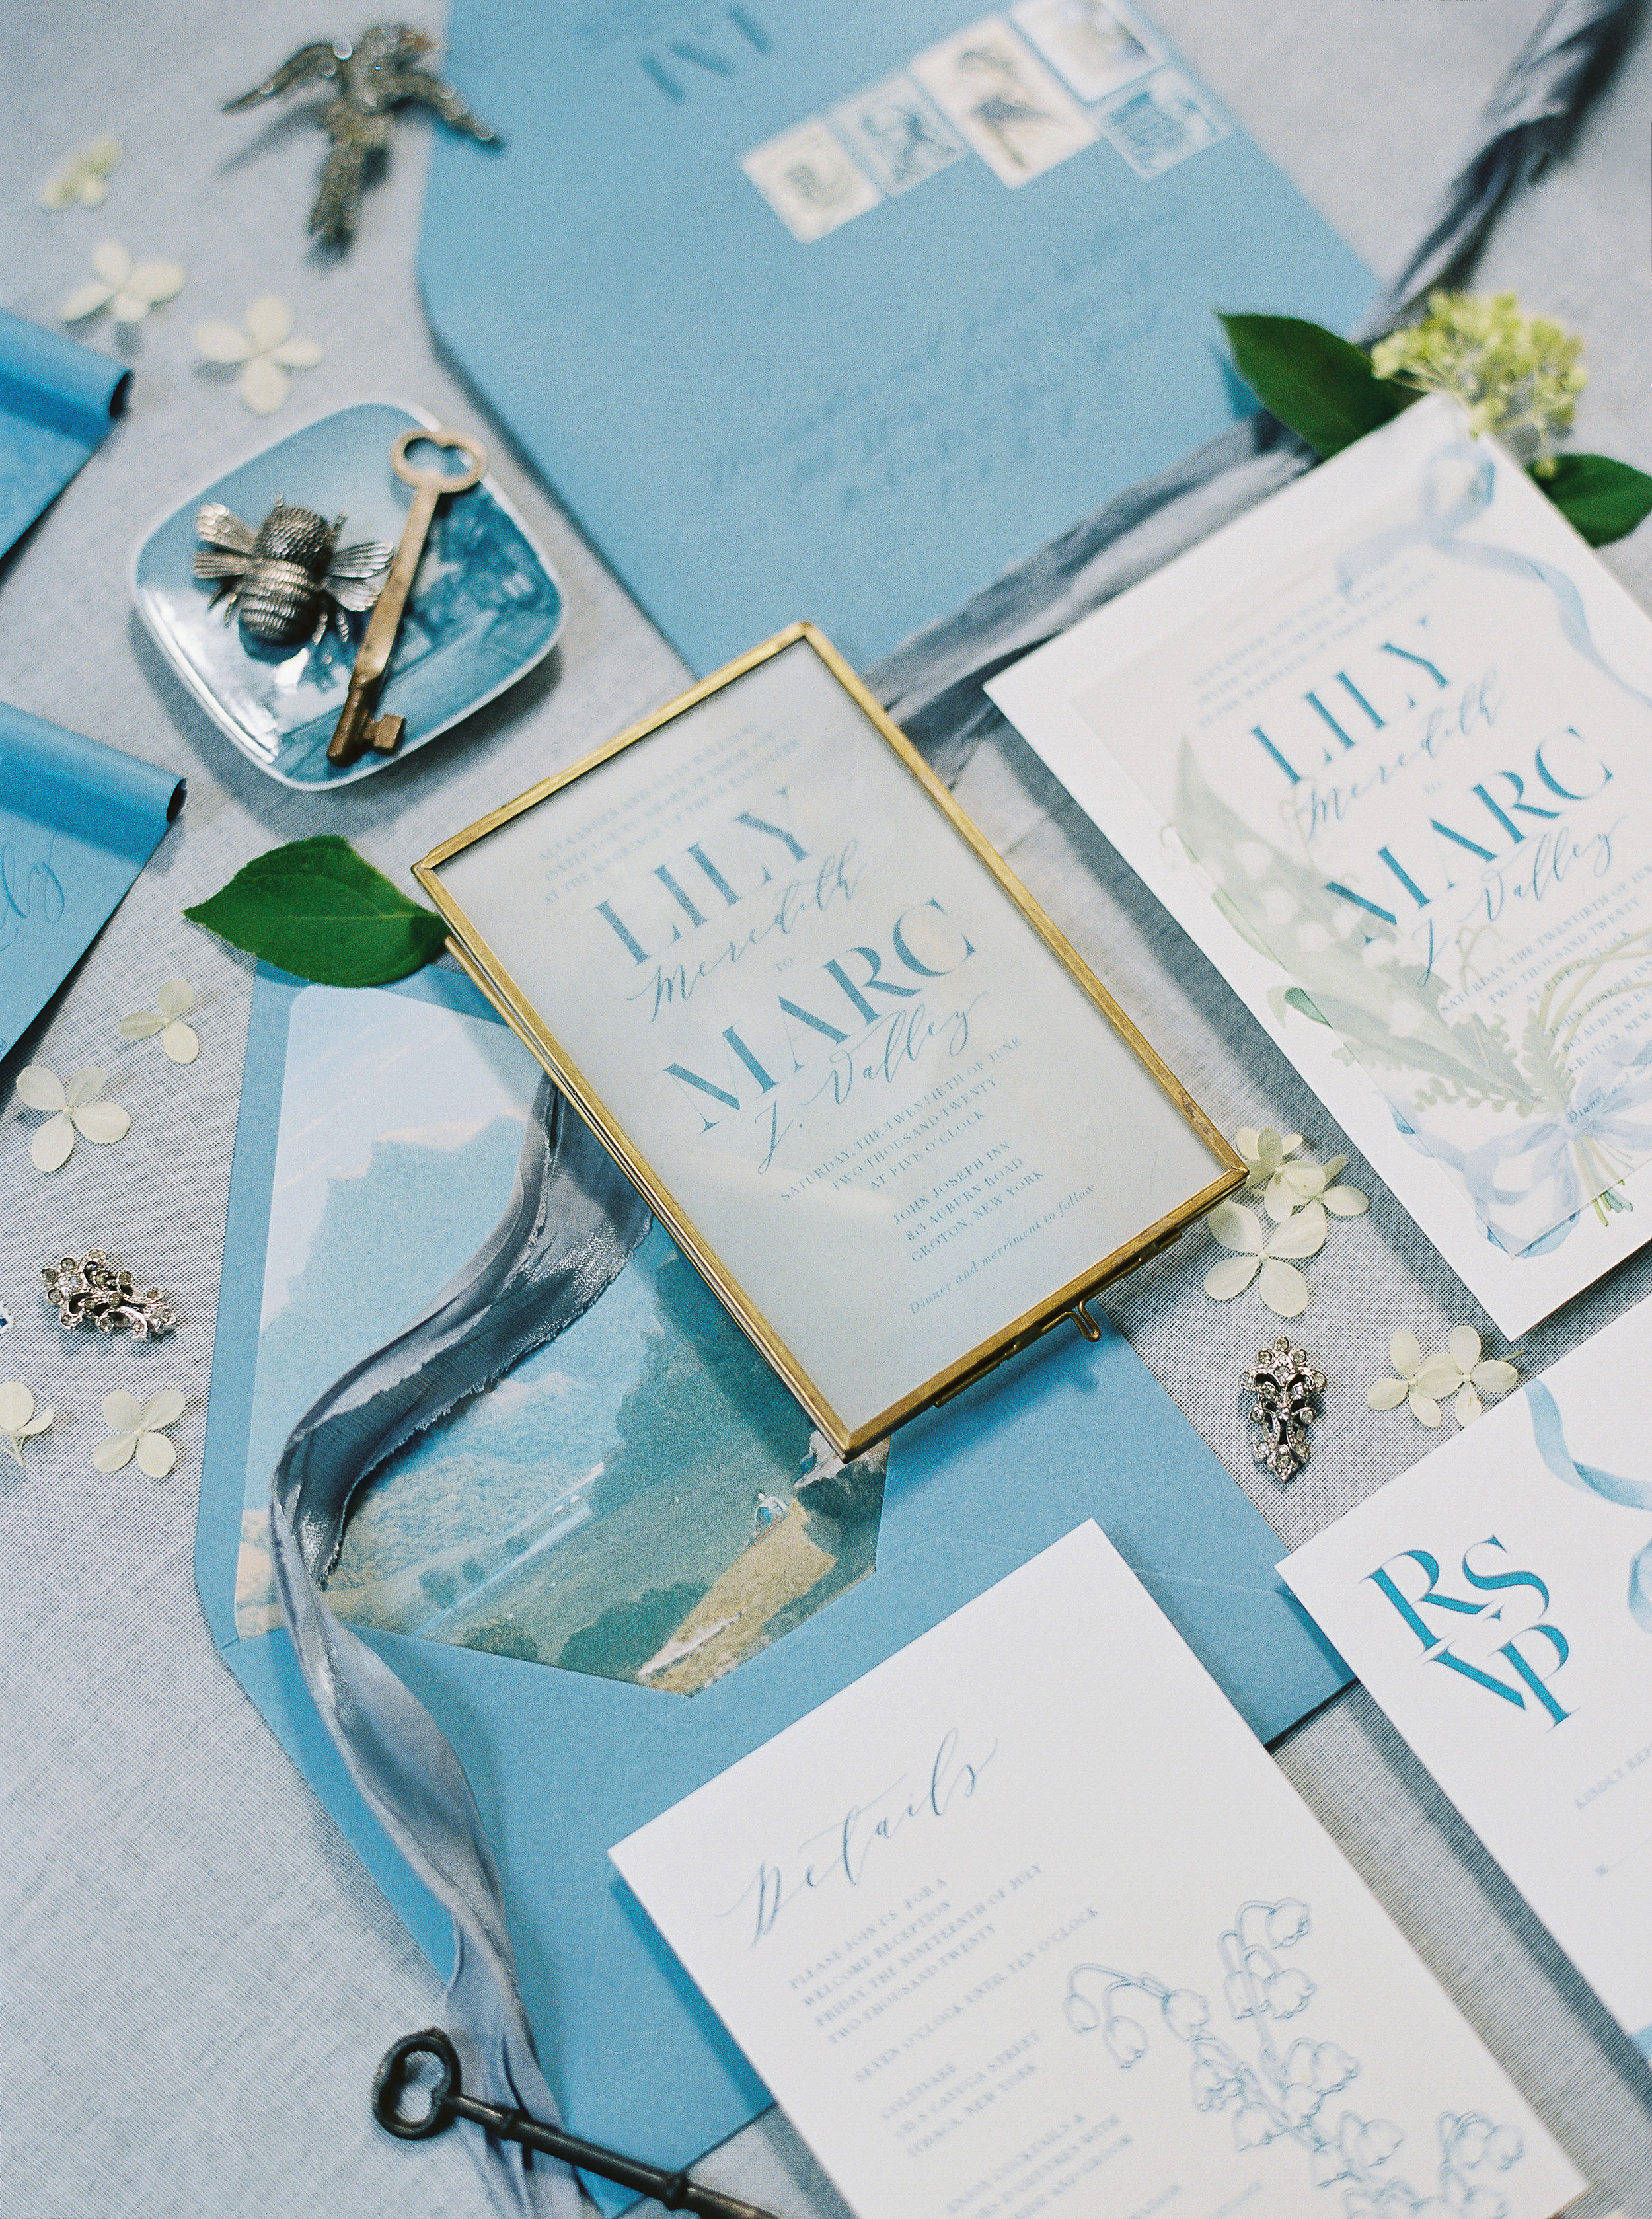 Alexandra-Elise-Photography-Film-Branding-Photographer-Rochester-New-York-Stone-Fruit-Studio-Wedding-Invitations-022.jpg